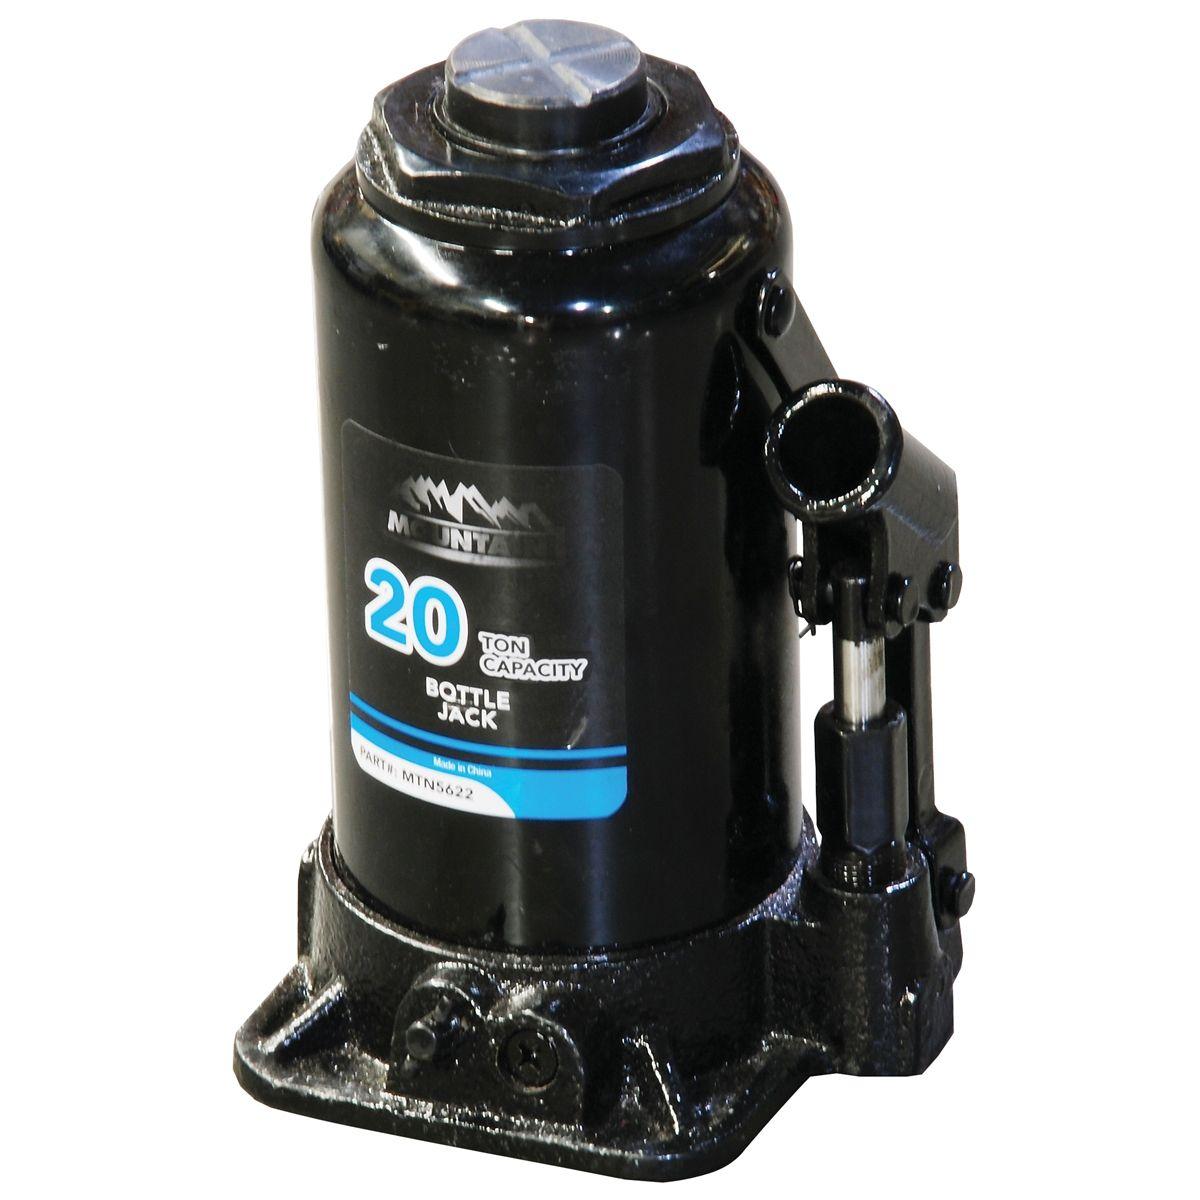 20 Ton Capacity Bottle Jack Mountain 5622a